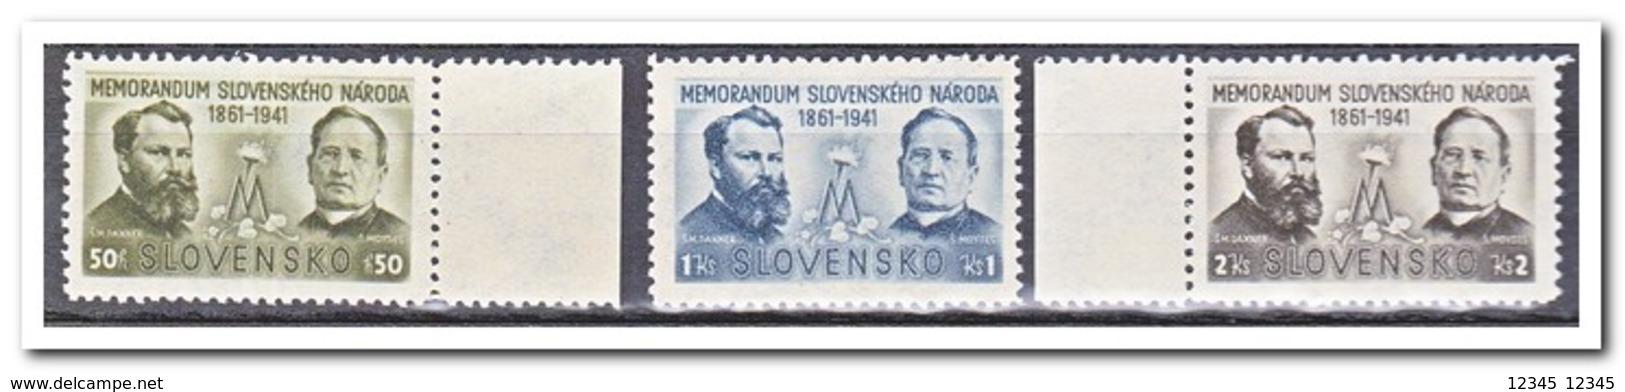 Slowakije 1941, Postfris MNH, 80 Anniversary Of The Handover Of A Memorandum To Emperor Franz Josef - Slovakia